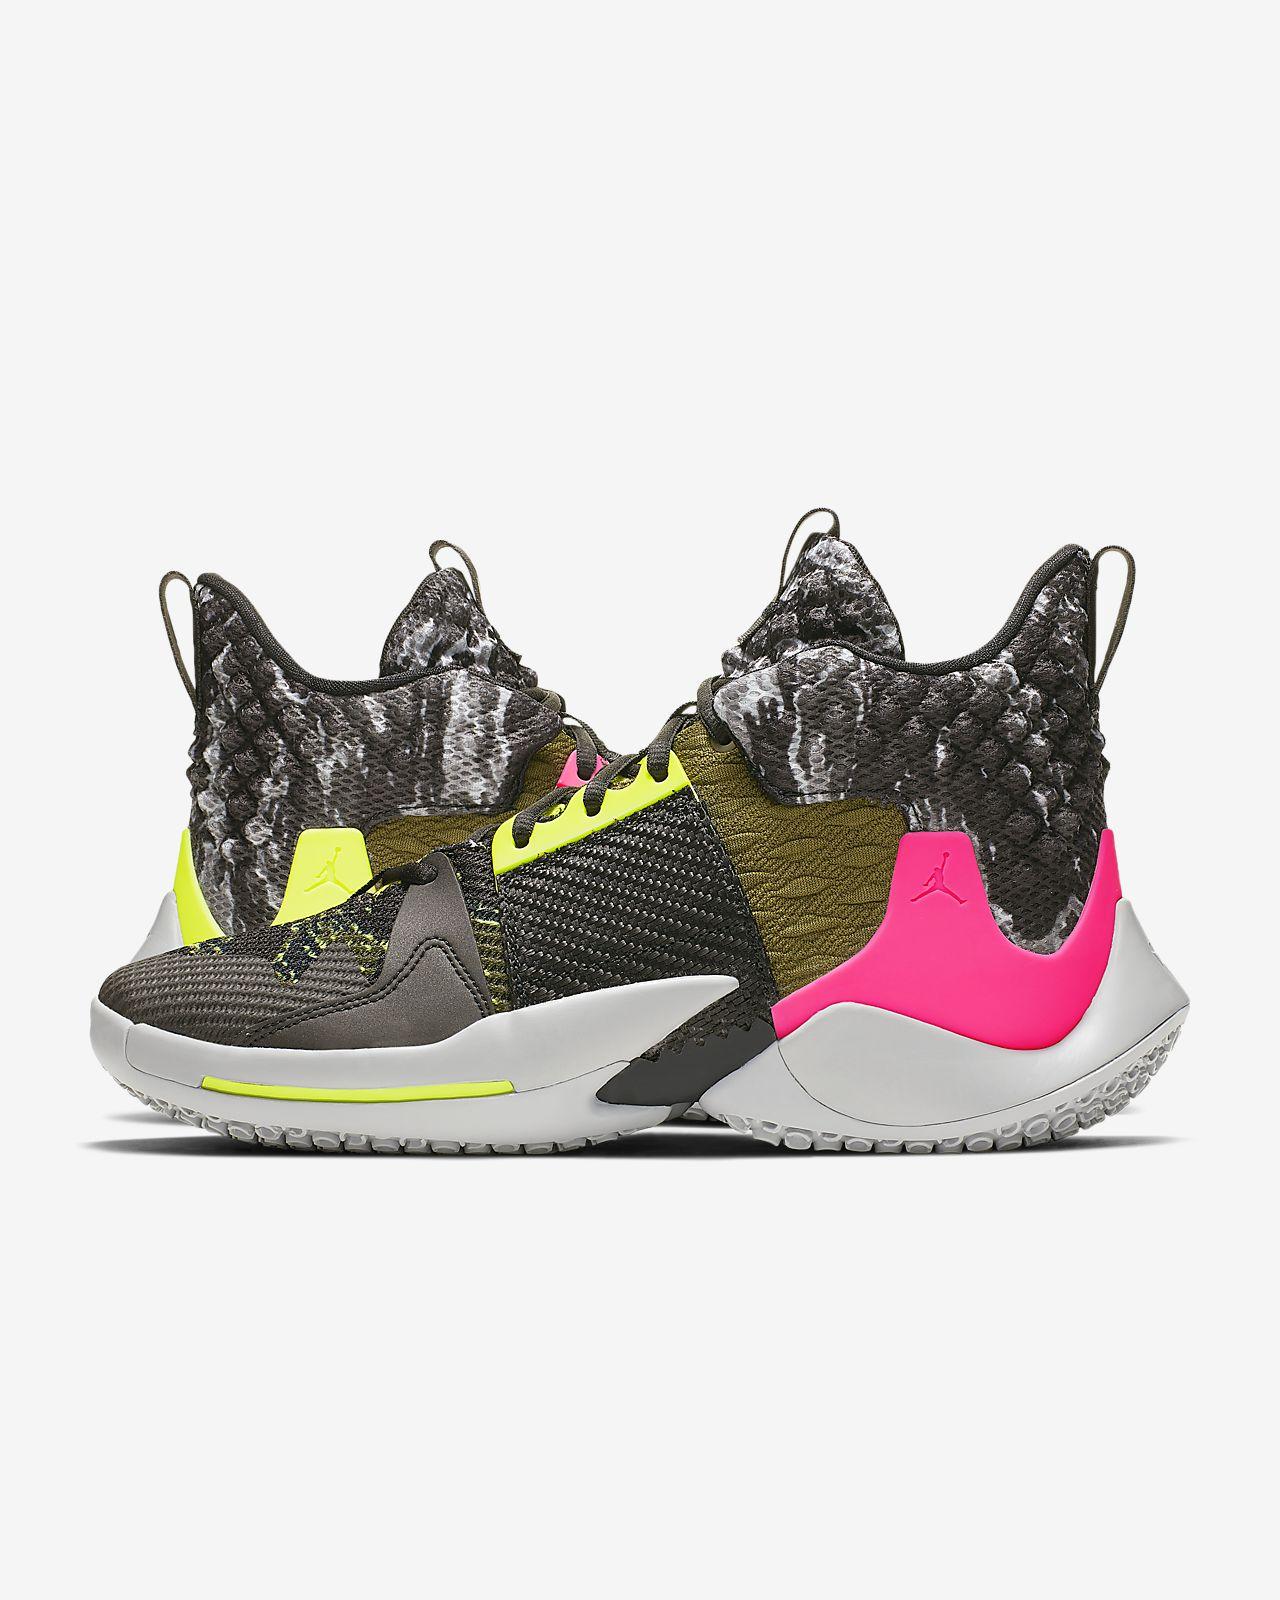 Jordan Basketball De Pour Zer0 « Why » Not 2 Chaussure HommeNike kiuwOZTPX